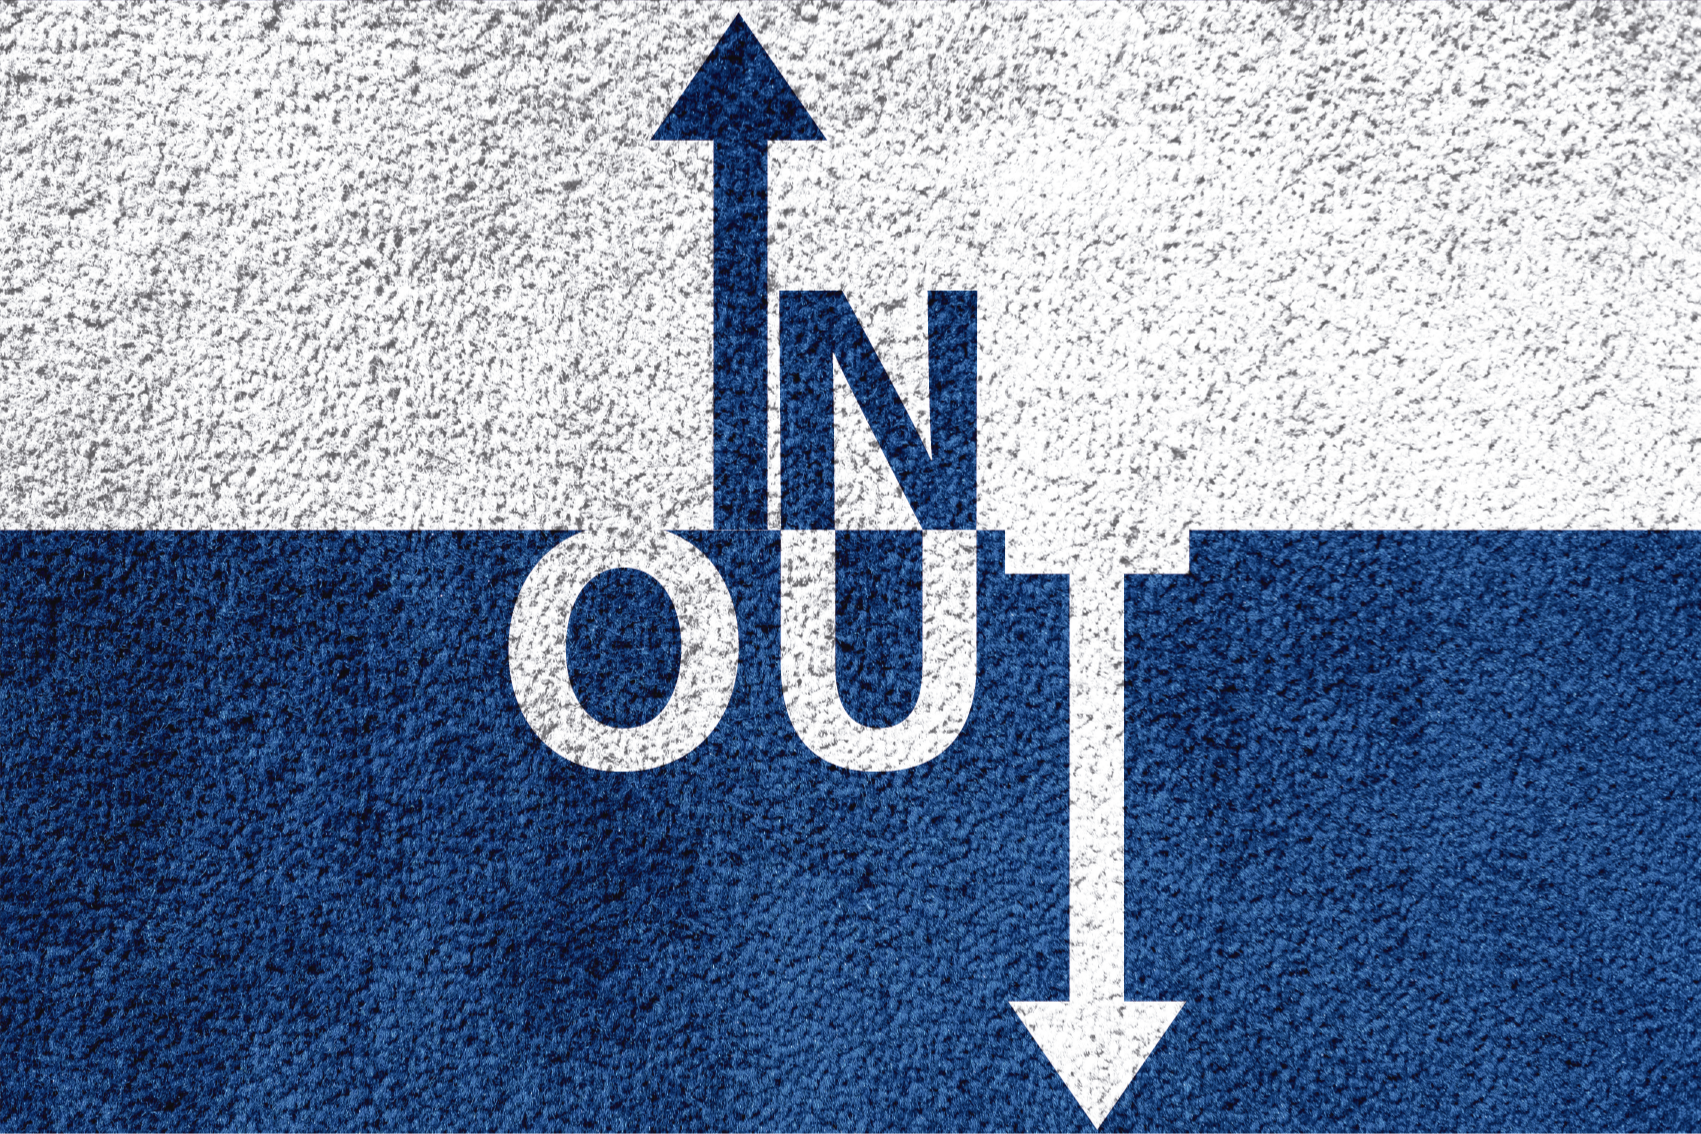 "TenStickers. 进出定制地毯. 这种创意地毯的特征是将文本"" in""和"" out""与i和t转换为箭头并指向正确的方向。"